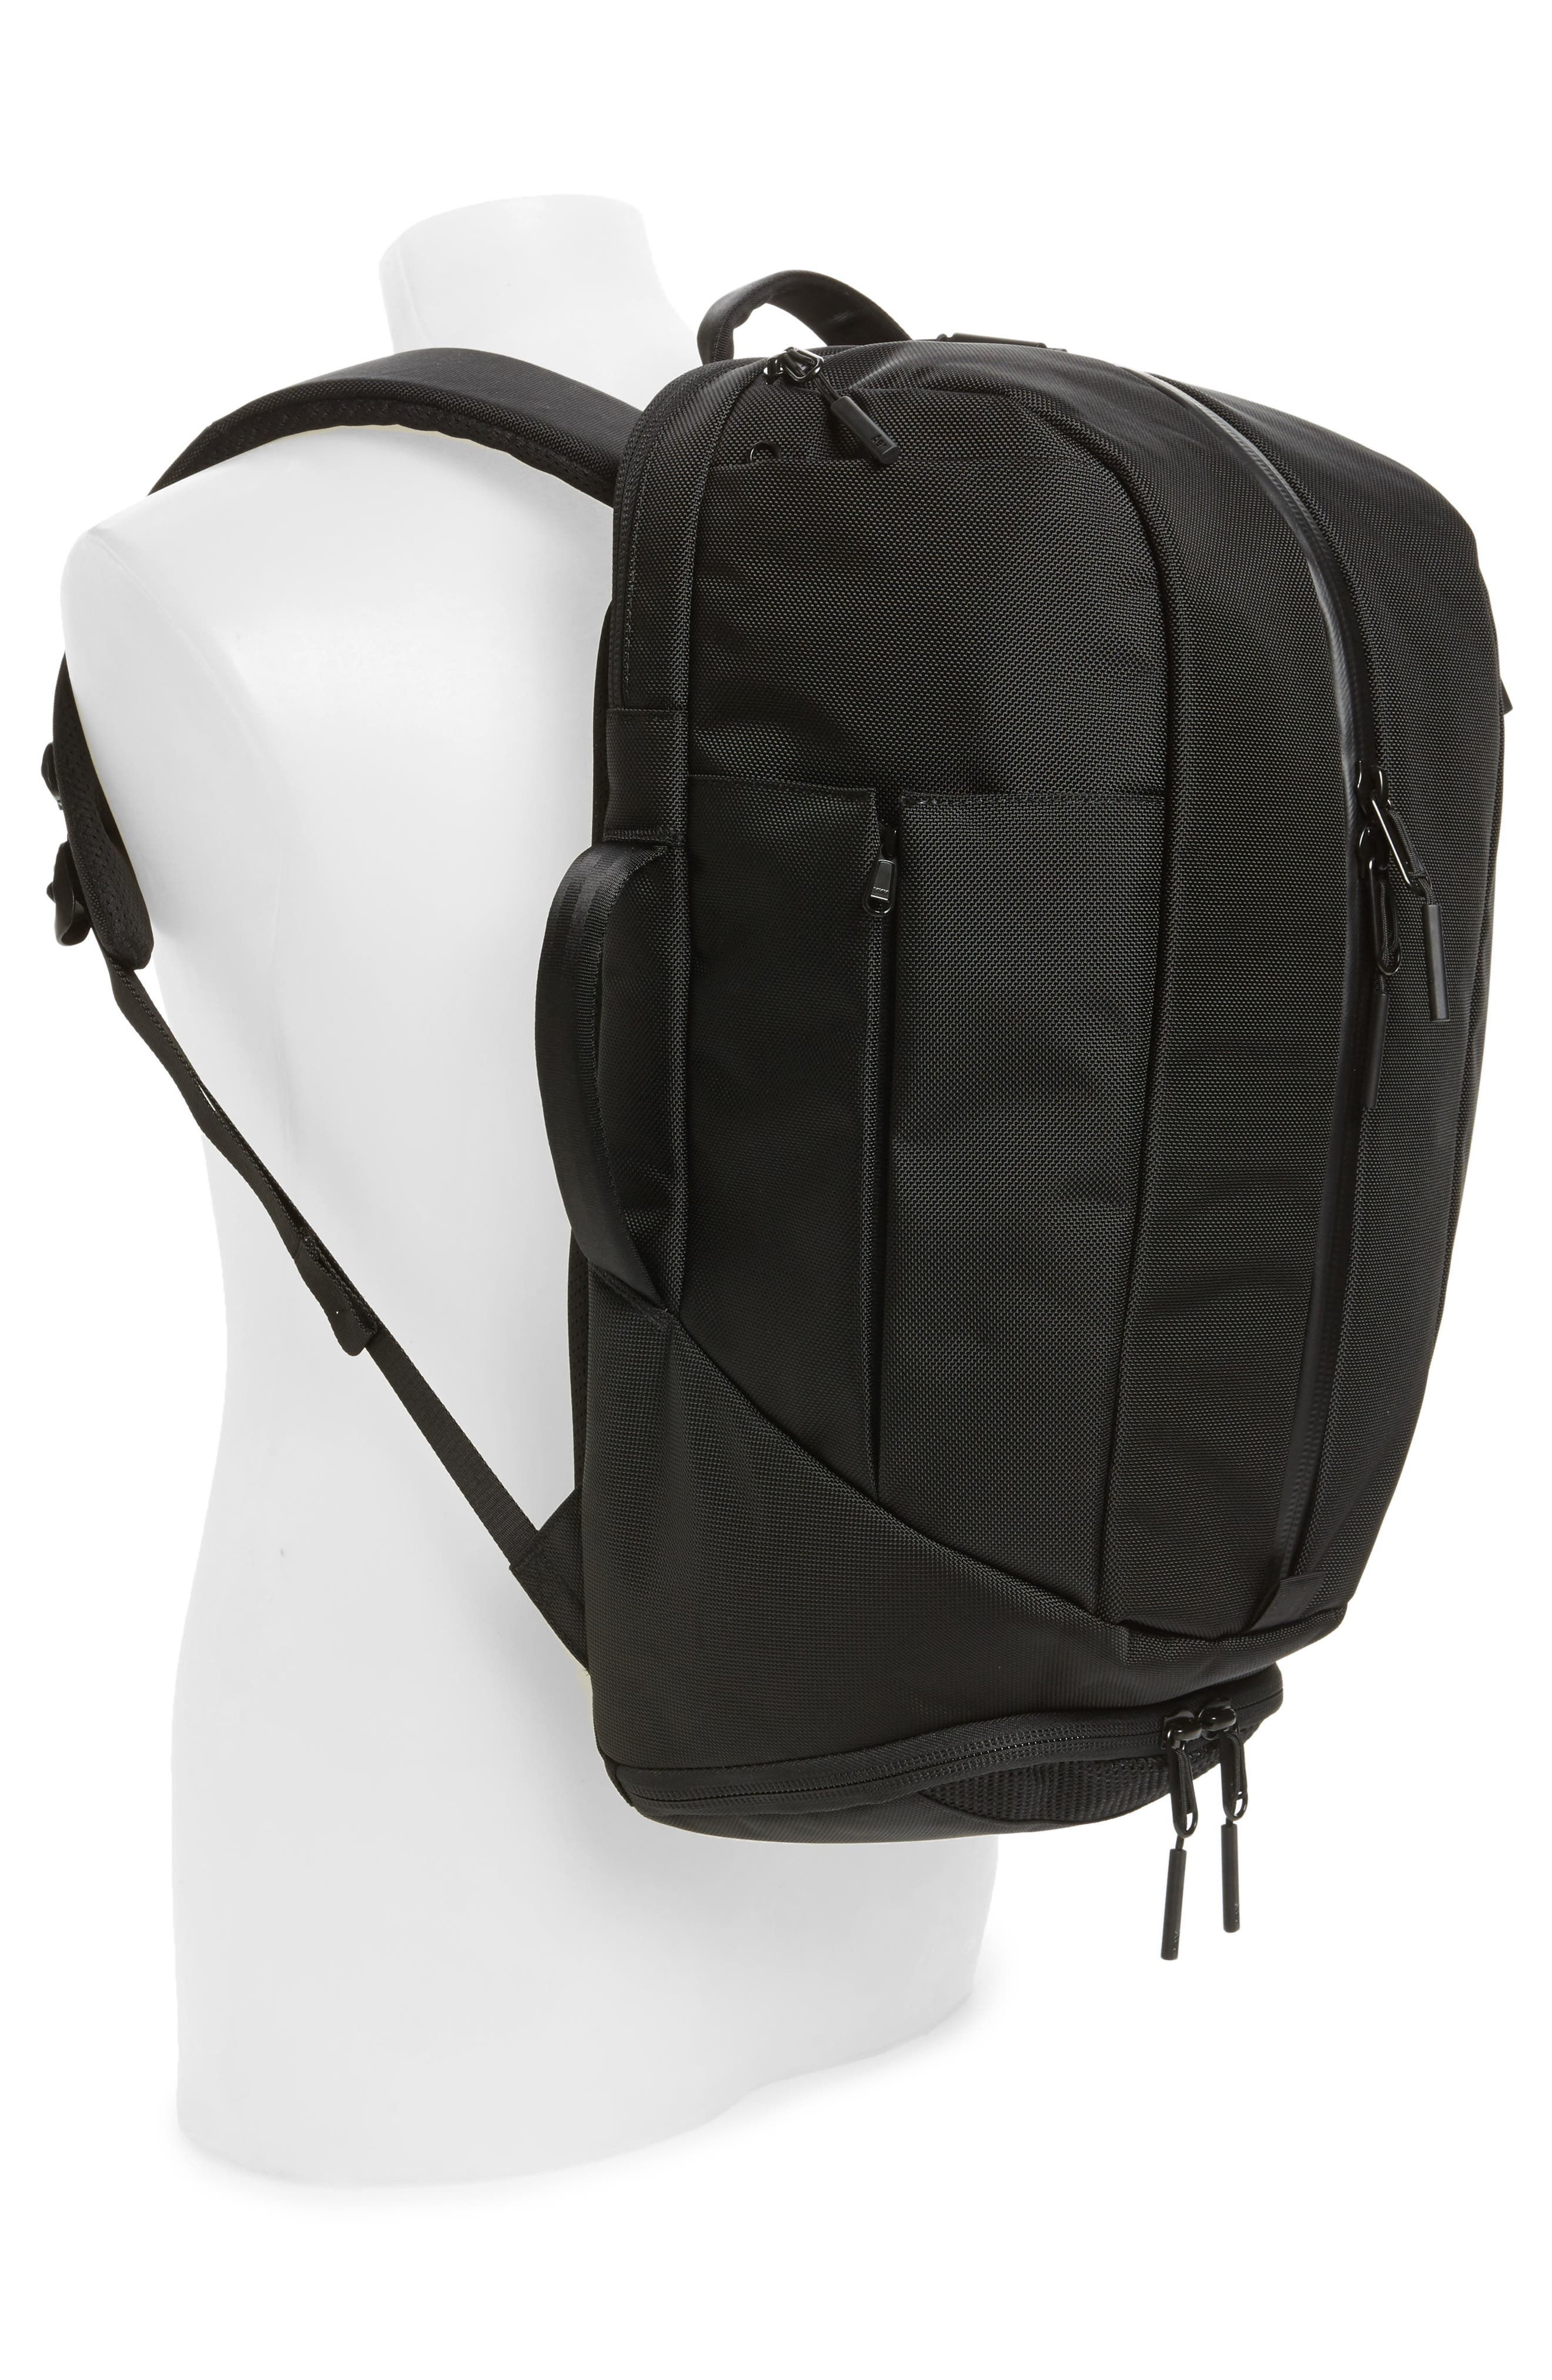 Duffel Pack 2 Convertible Backpack,                             Alternate thumbnail 2, color,                             BLACK